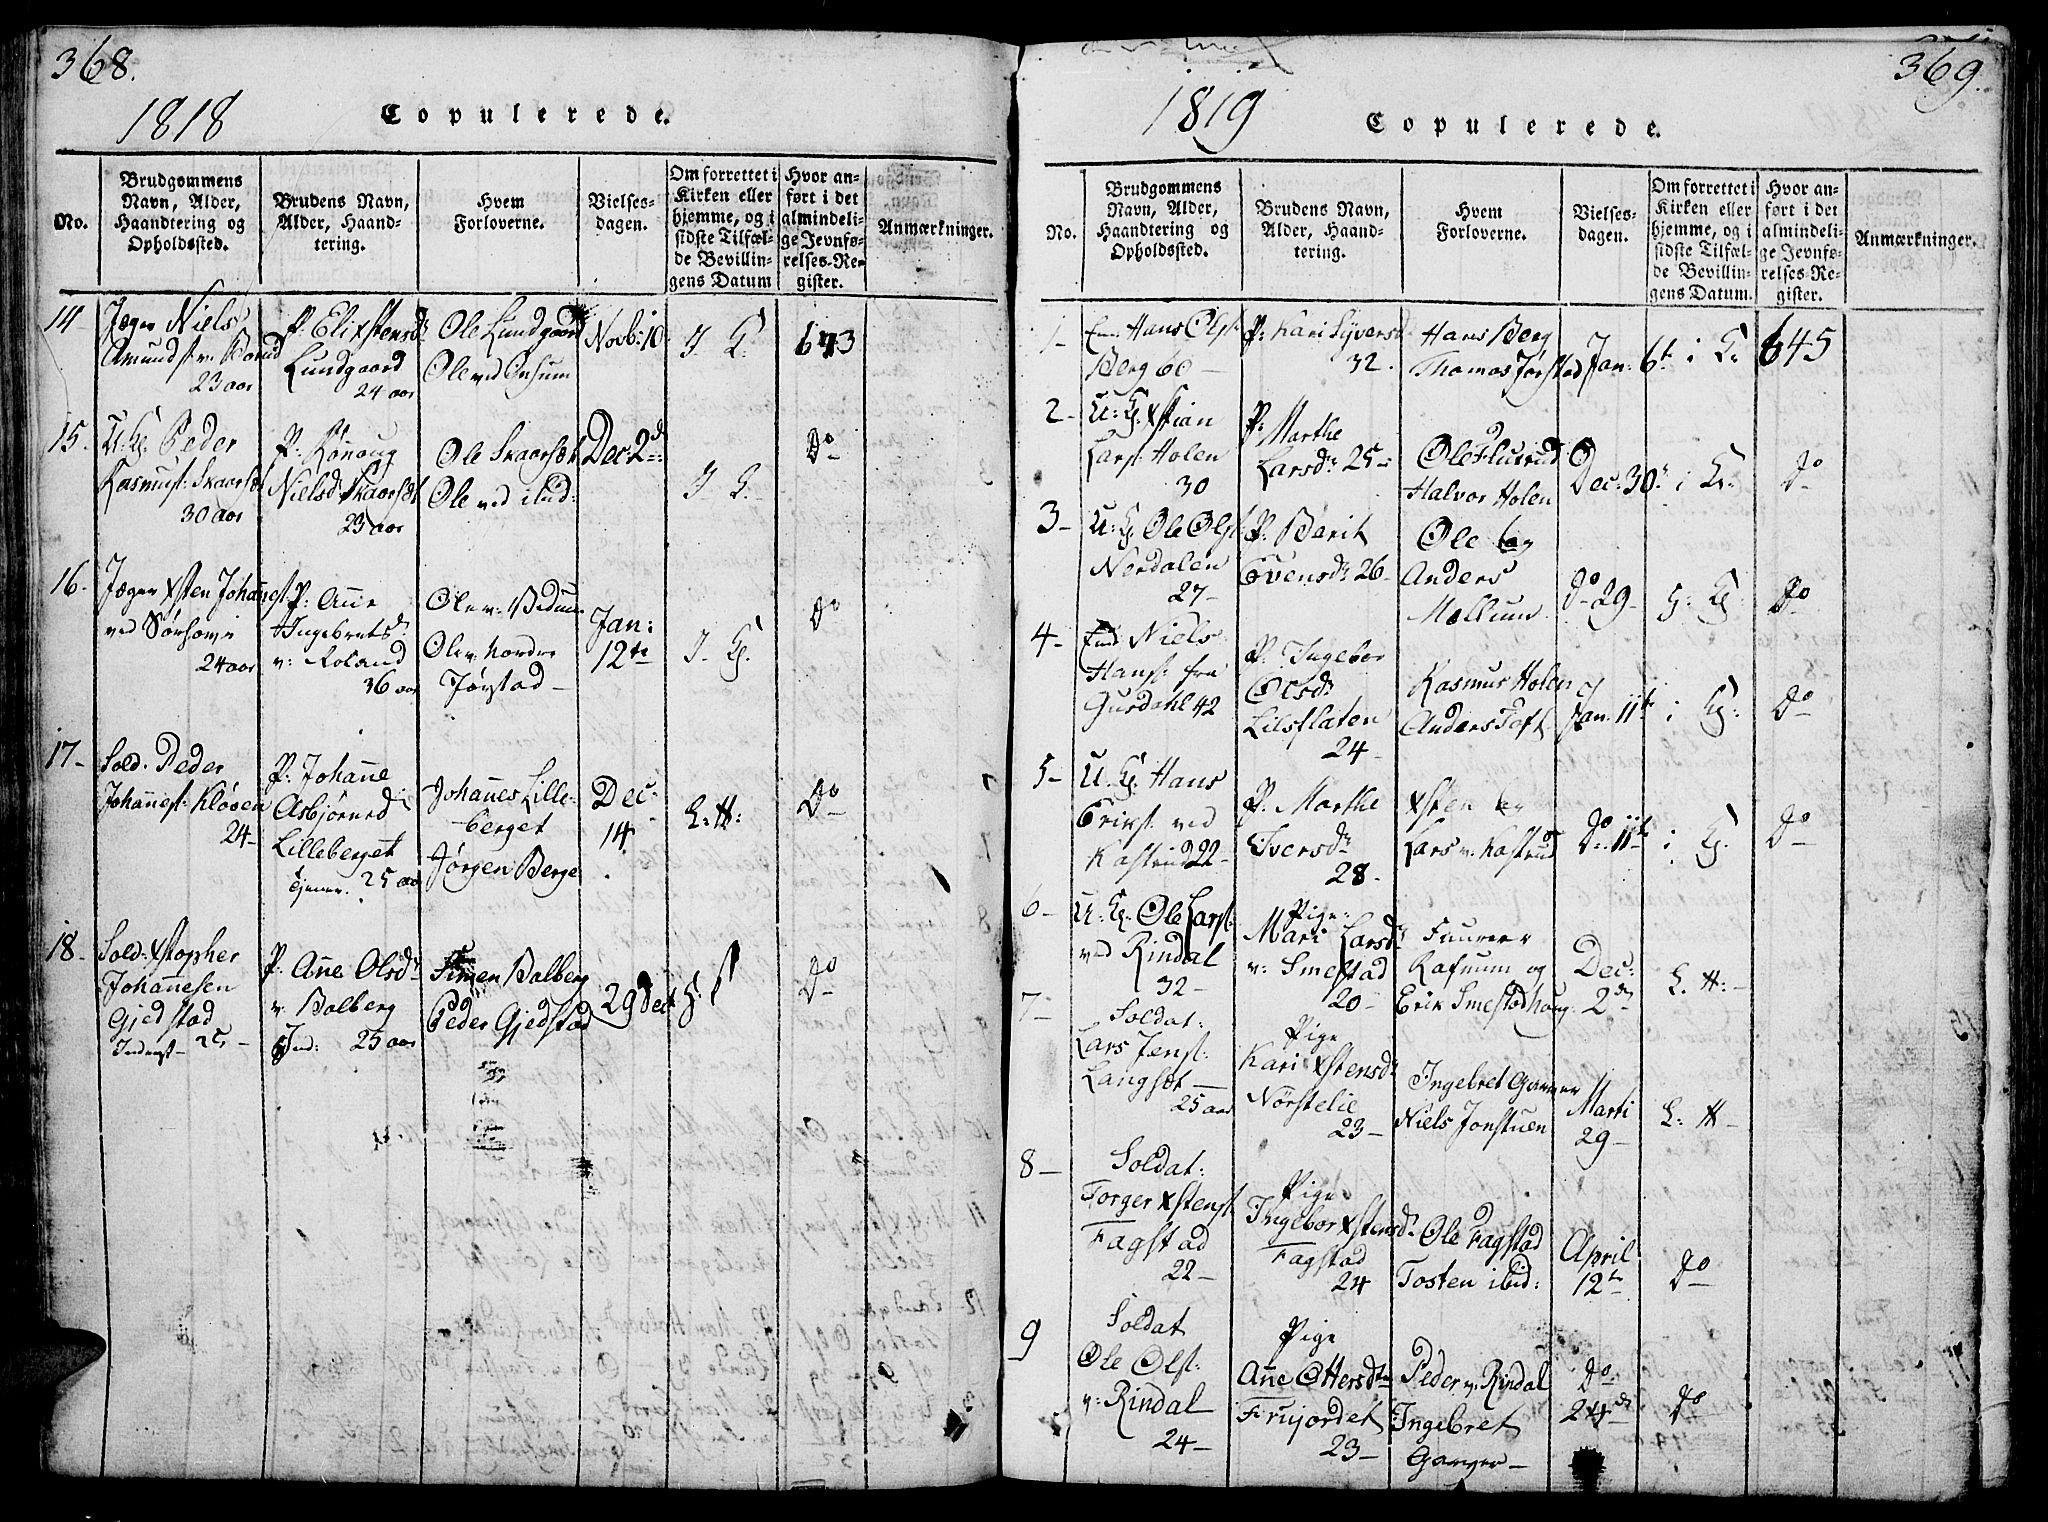 SAH, Fåberg prestekontor, Klokkerbok nr. 4, 1818-1837, s. 368-369